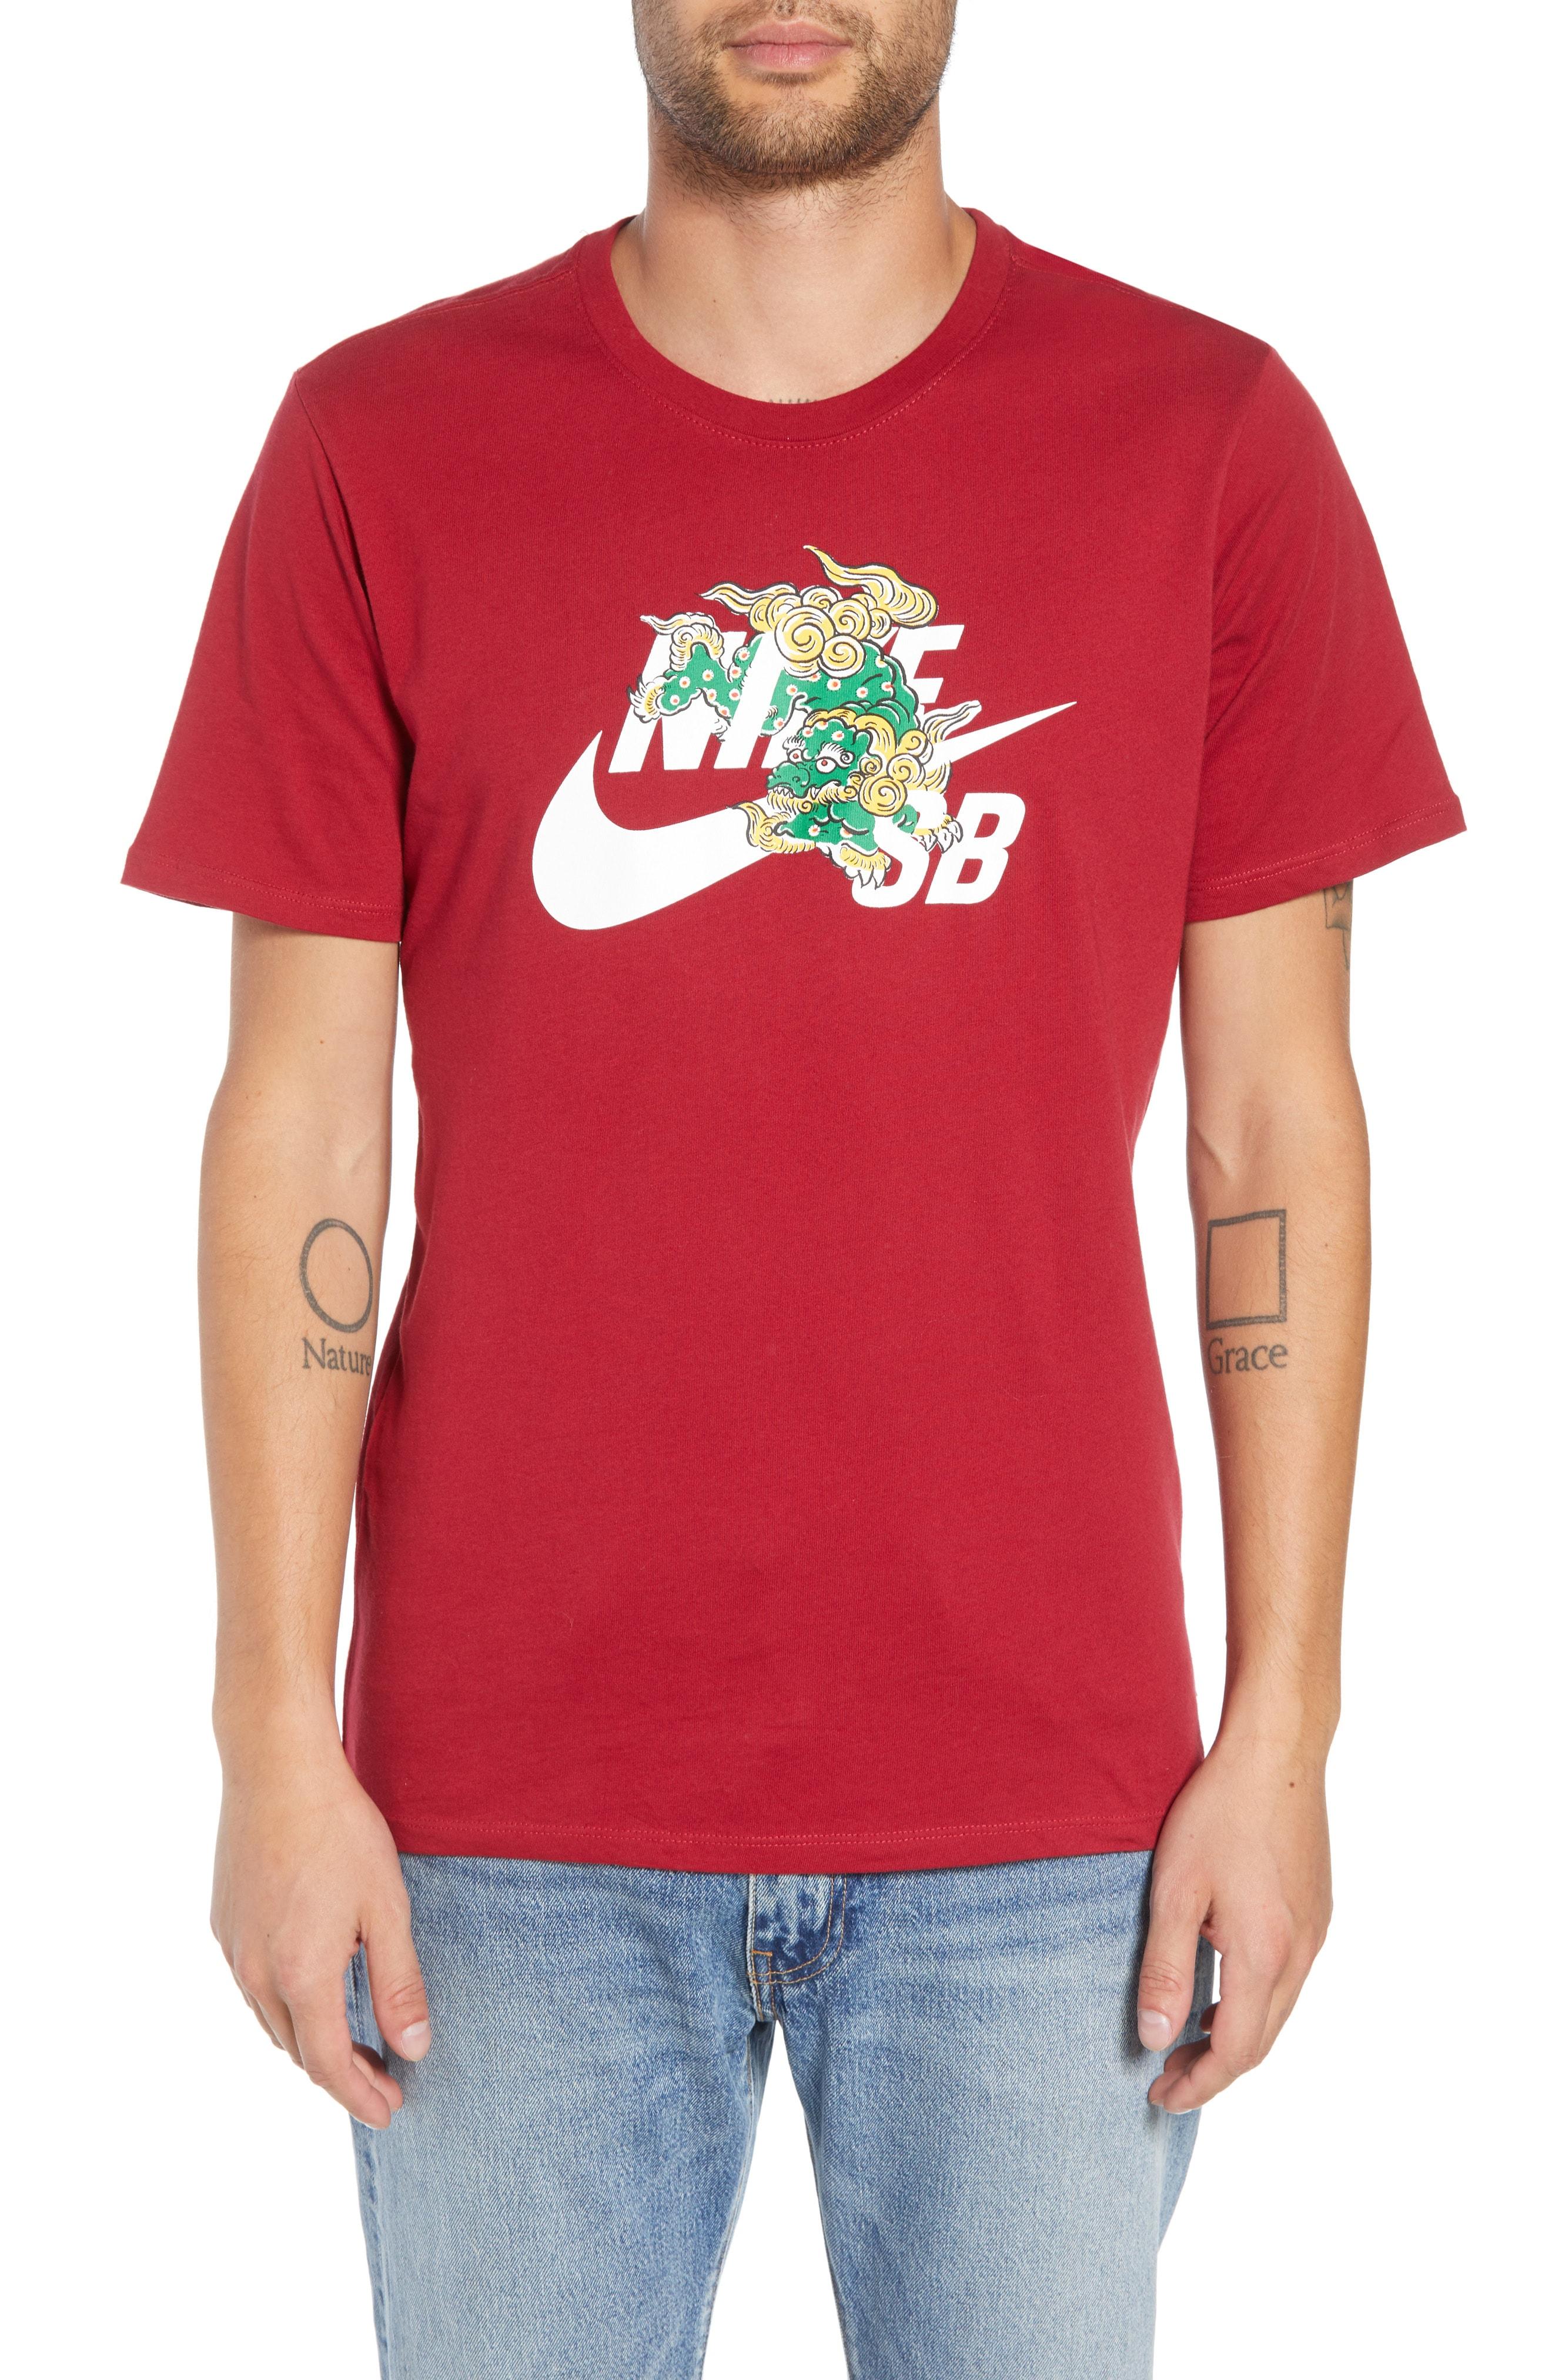 Nike SB Year of the Dog T-Shirt